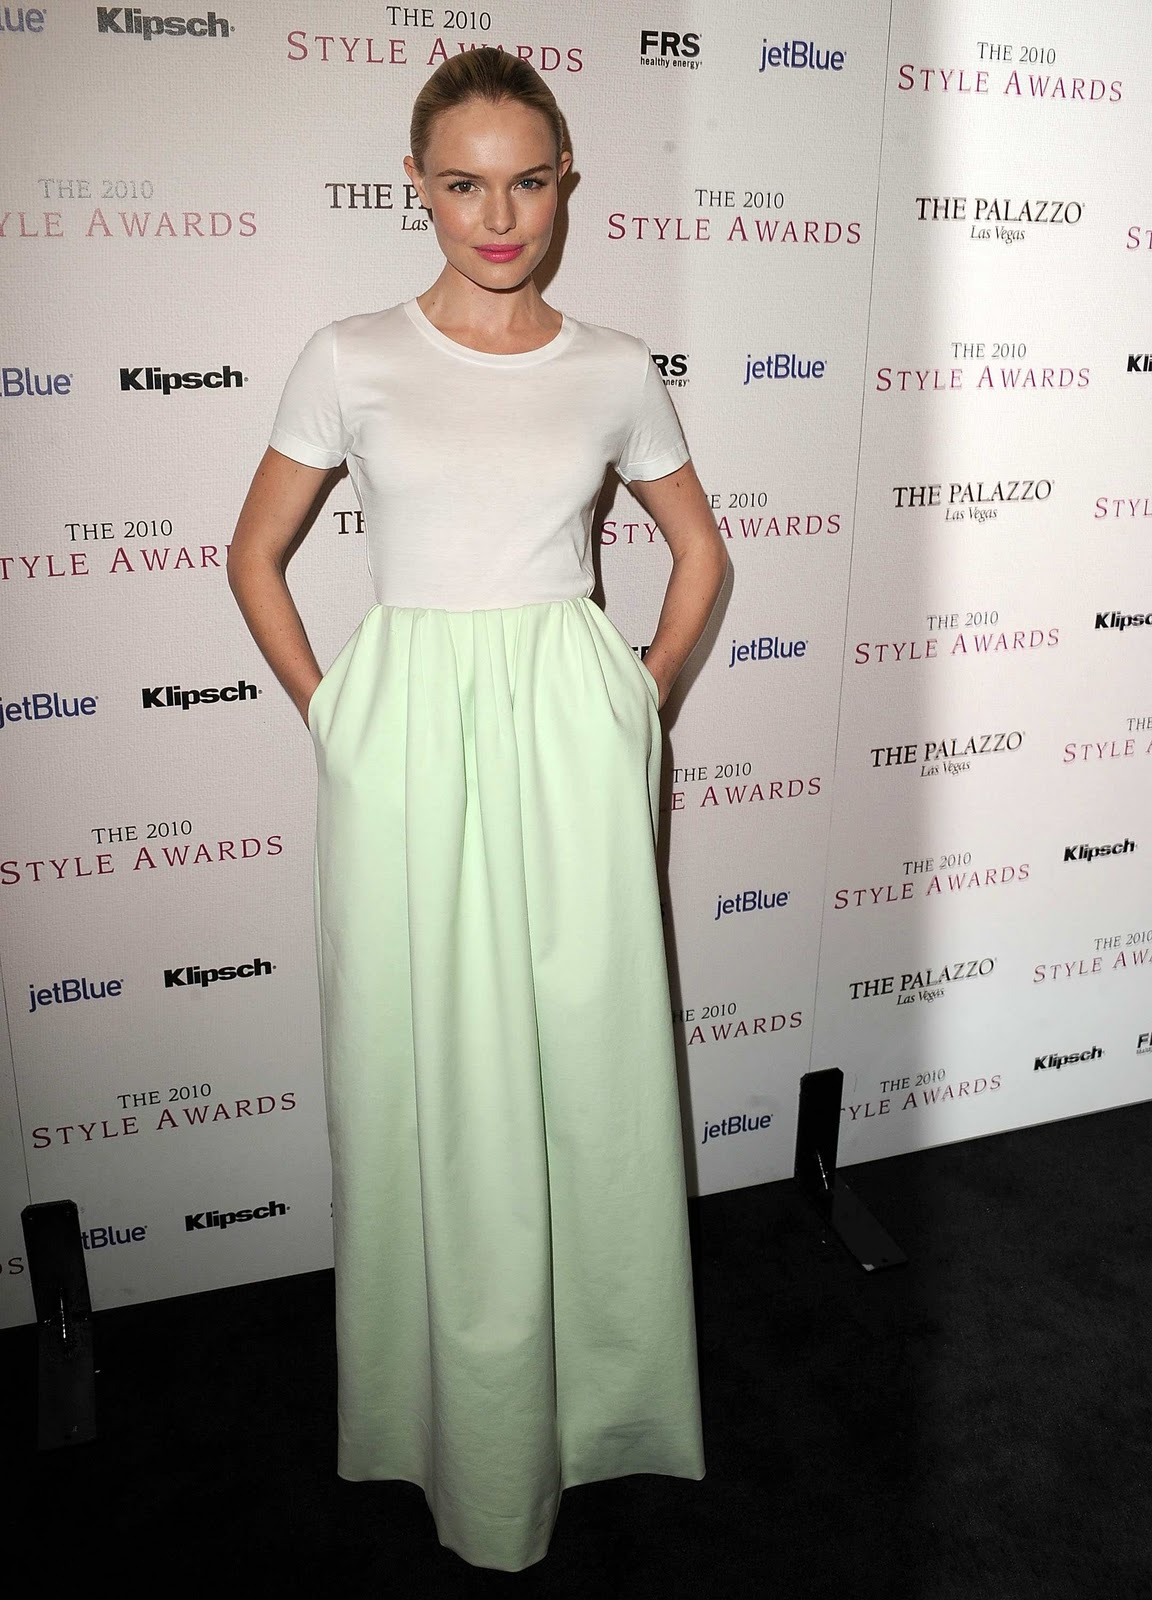 http://2.bp.blogspot.com/-G0n0gh2f6-k/TWBVDuTDHVI/AAAAAAAABdY/SVpve8kjZJM/s1600/KateBosworth_2010_Hollywood_Style_Awards_LA_121210_+%25283%2529.jpg